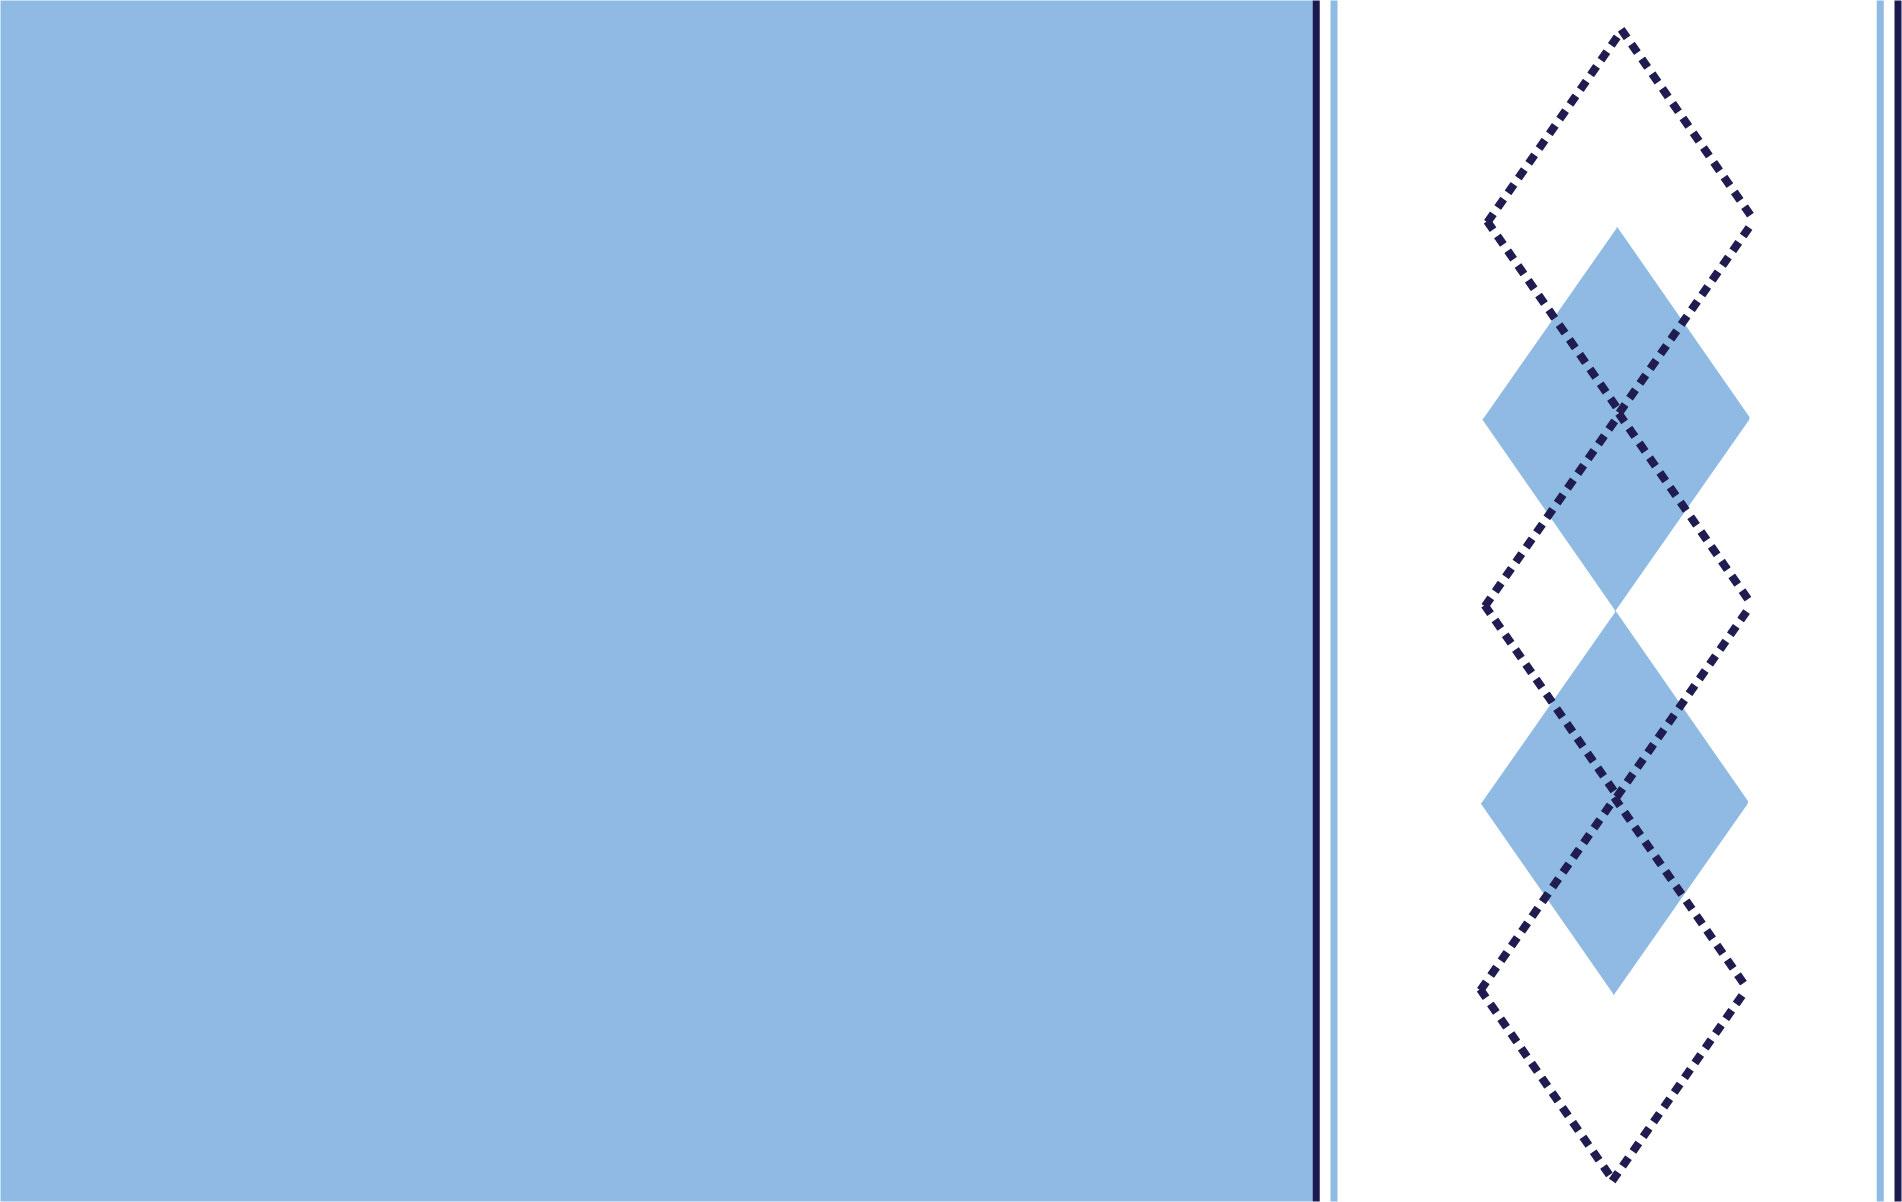 school  team specific patterns and designs sports logos chris creamer logos mlb chris creamer logos site